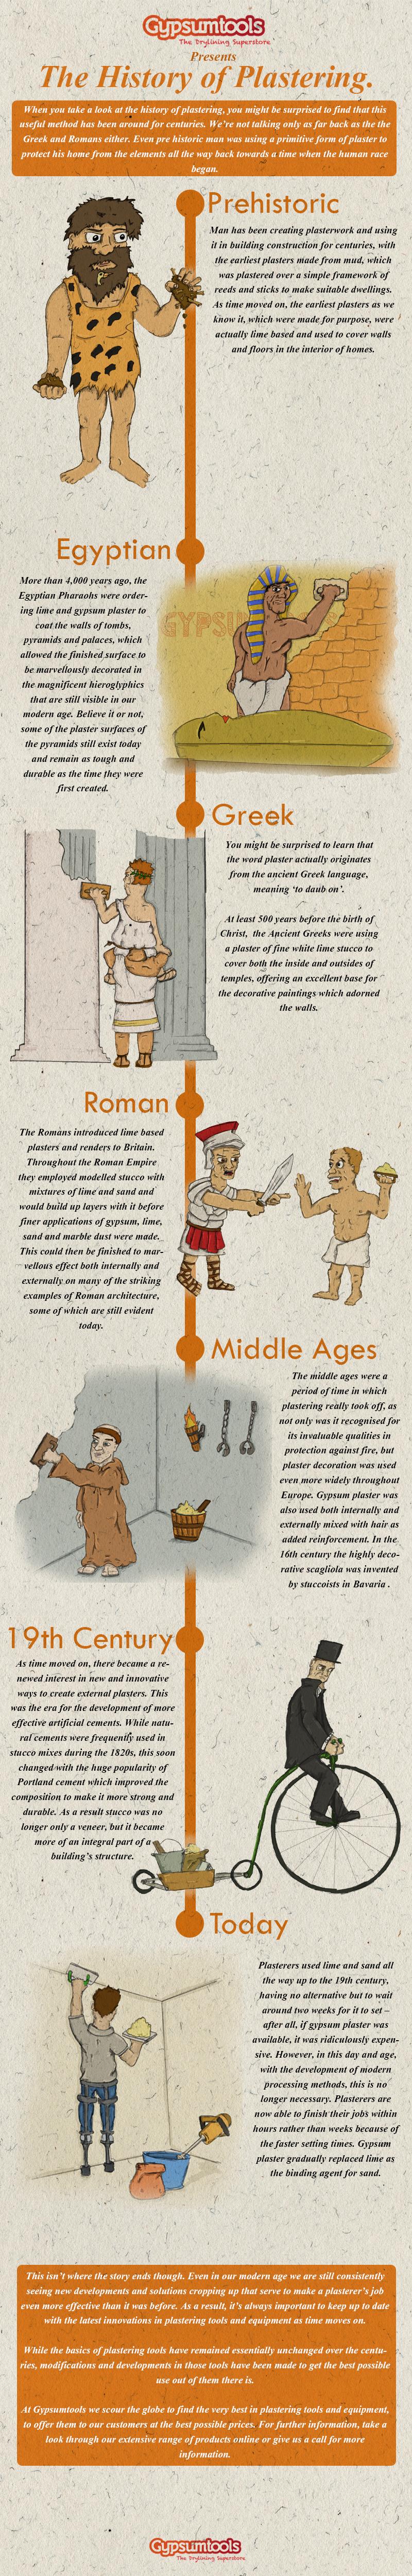 history-of-plastering